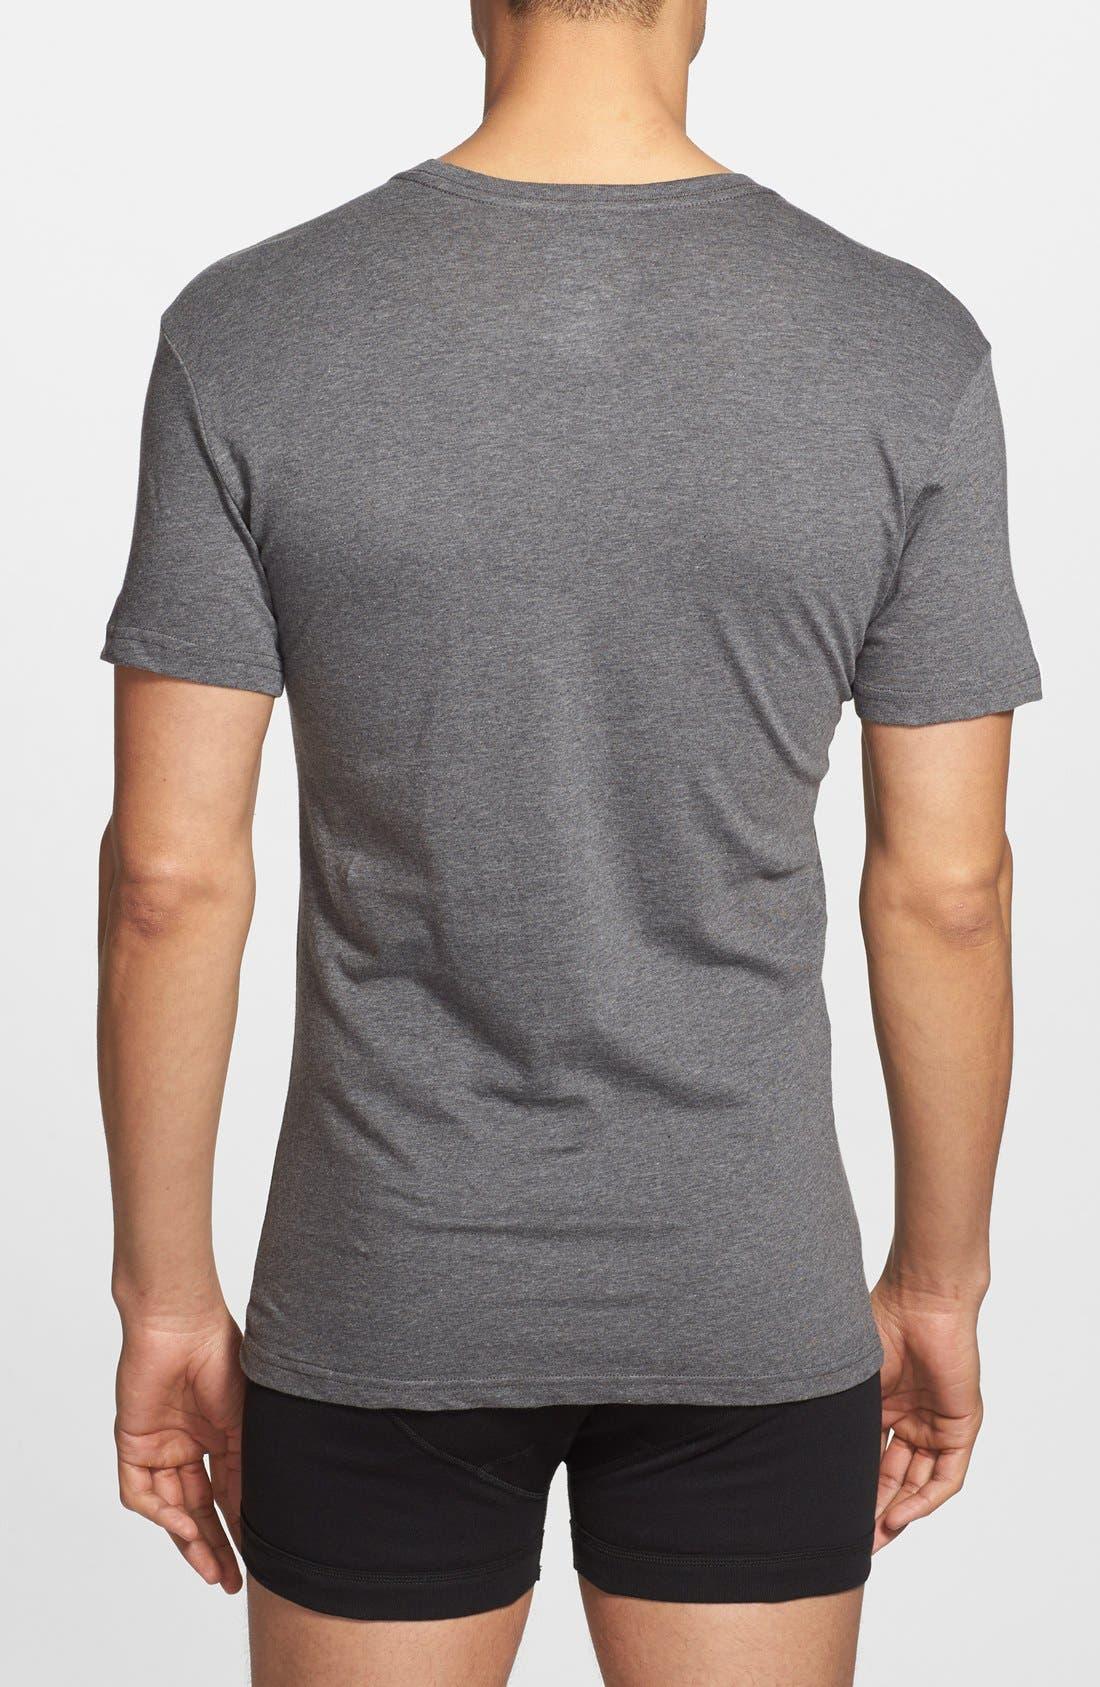 3-Pack Slim Fit T-Shirt,                             Alternate thumbnail 3, color,                             BLACK/ GREY/ CHARCOAL